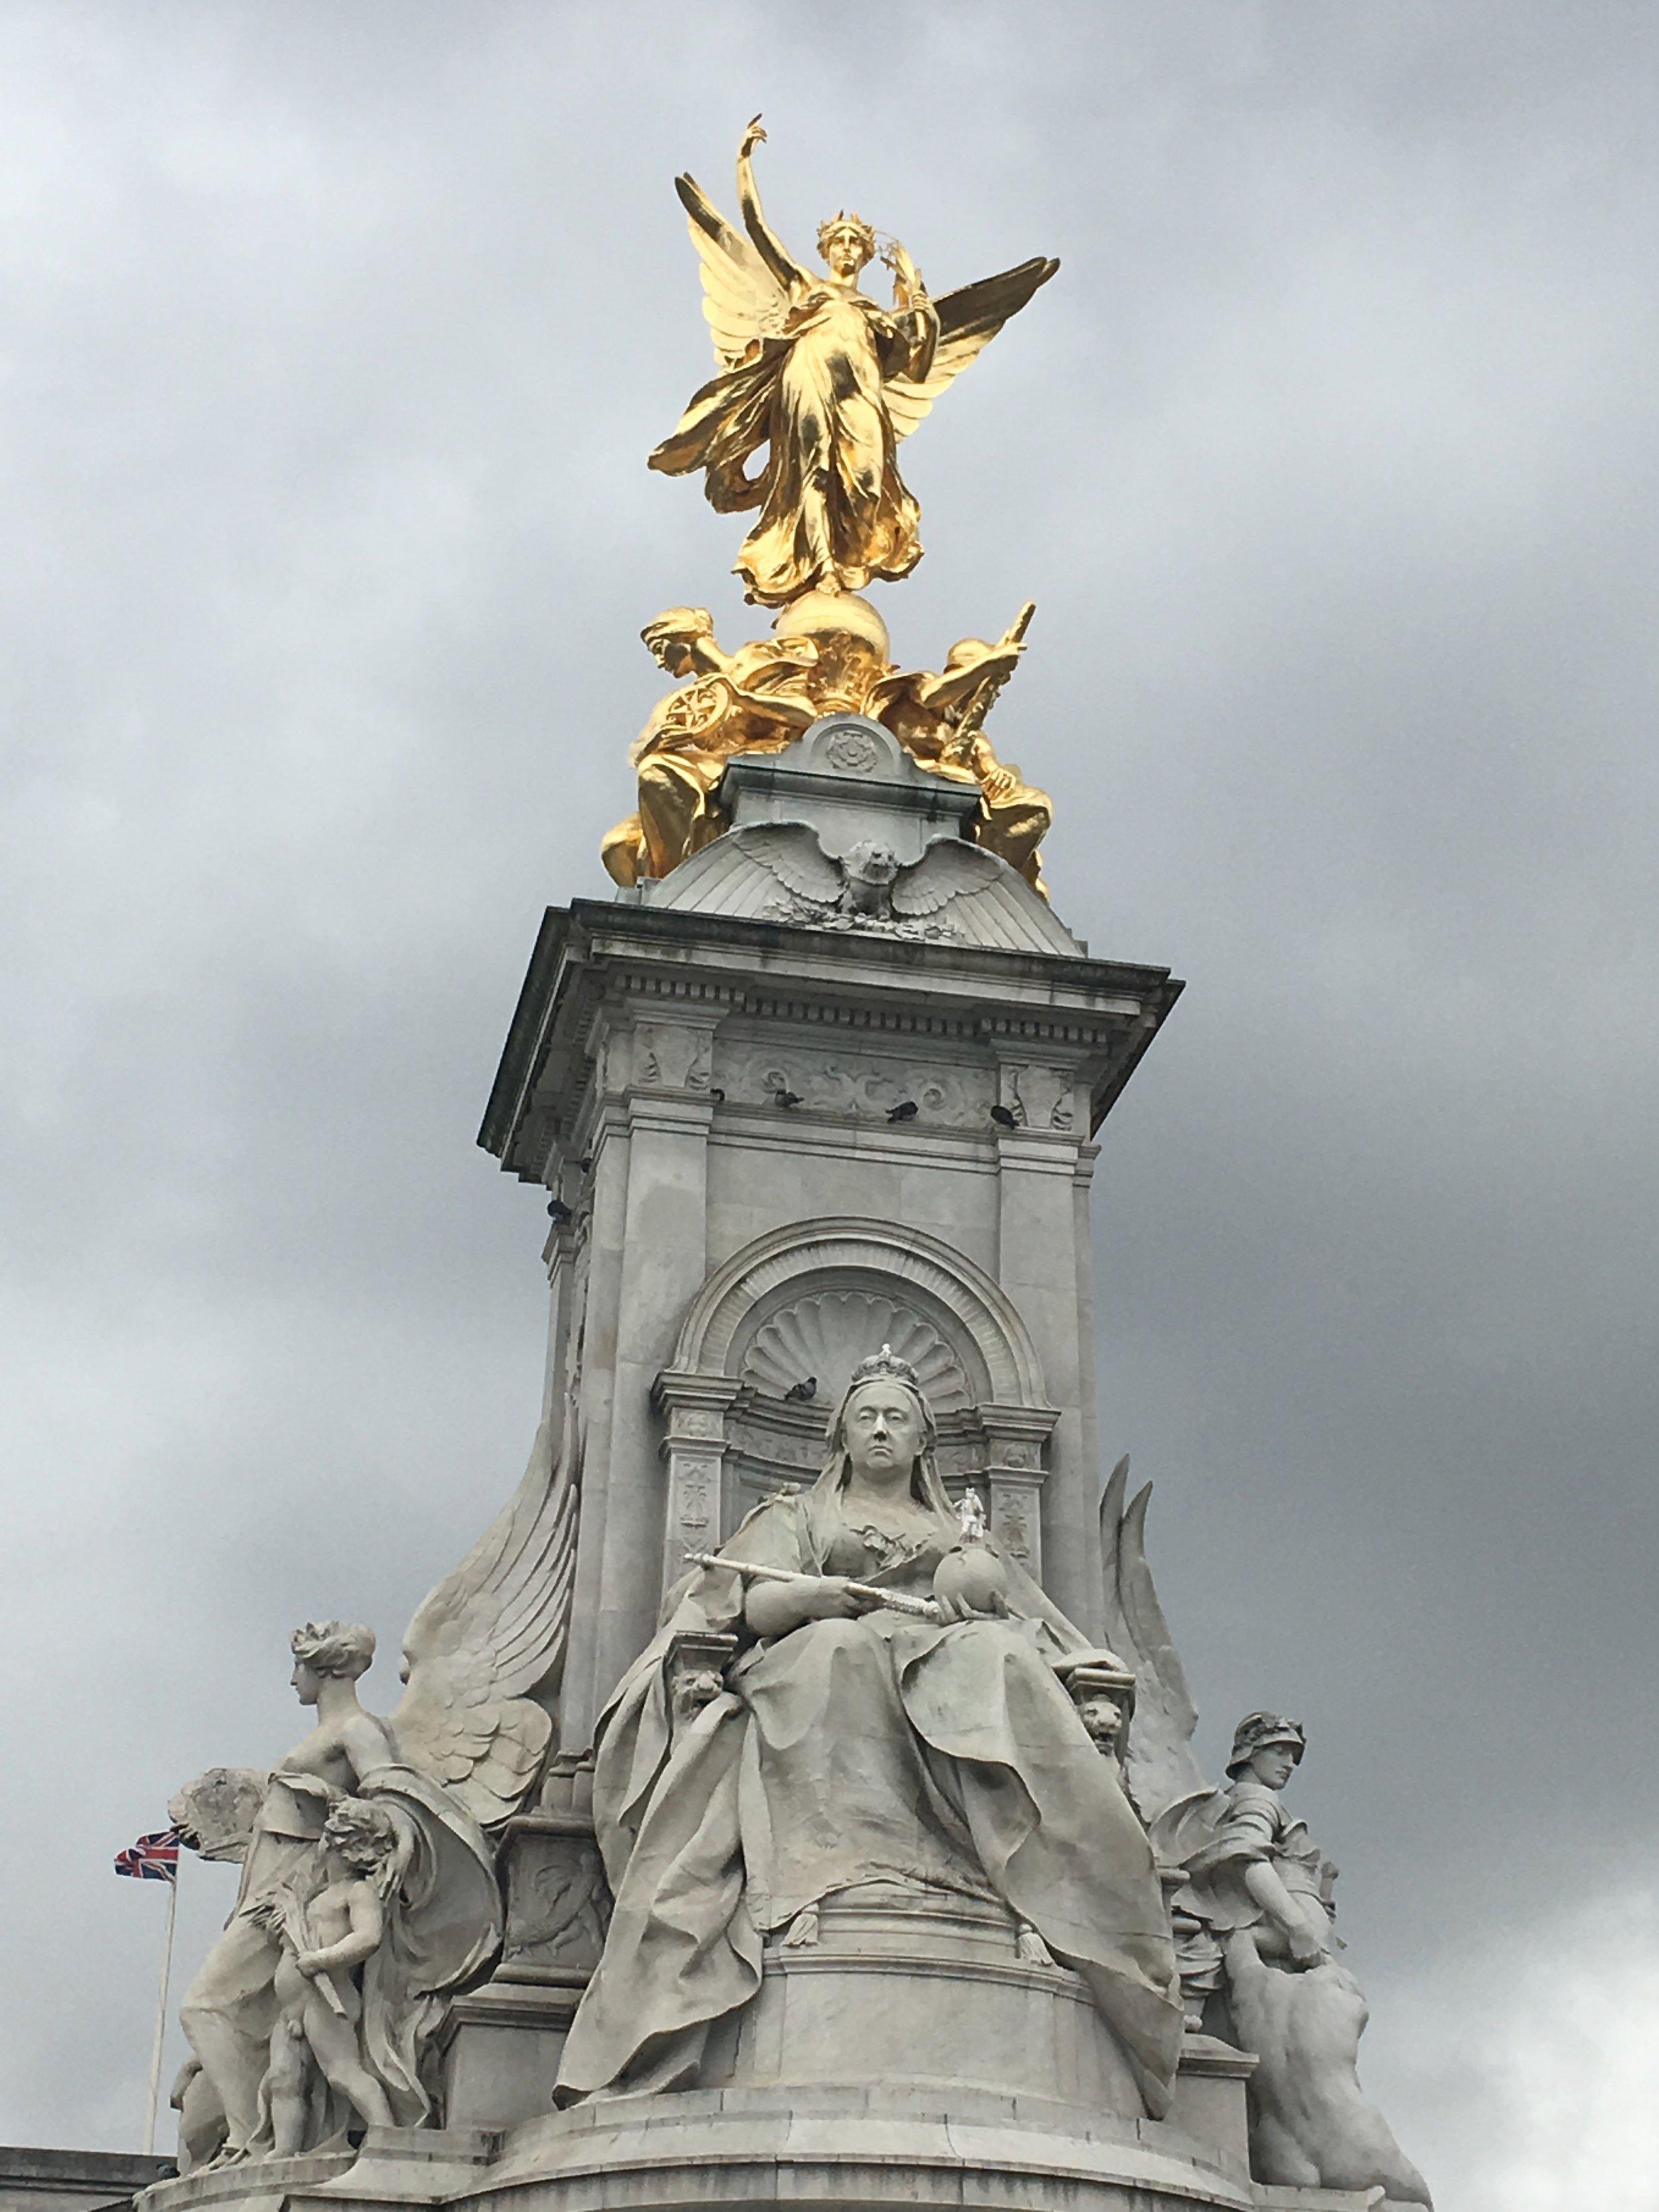 Fountain outside of Buckingham Palace